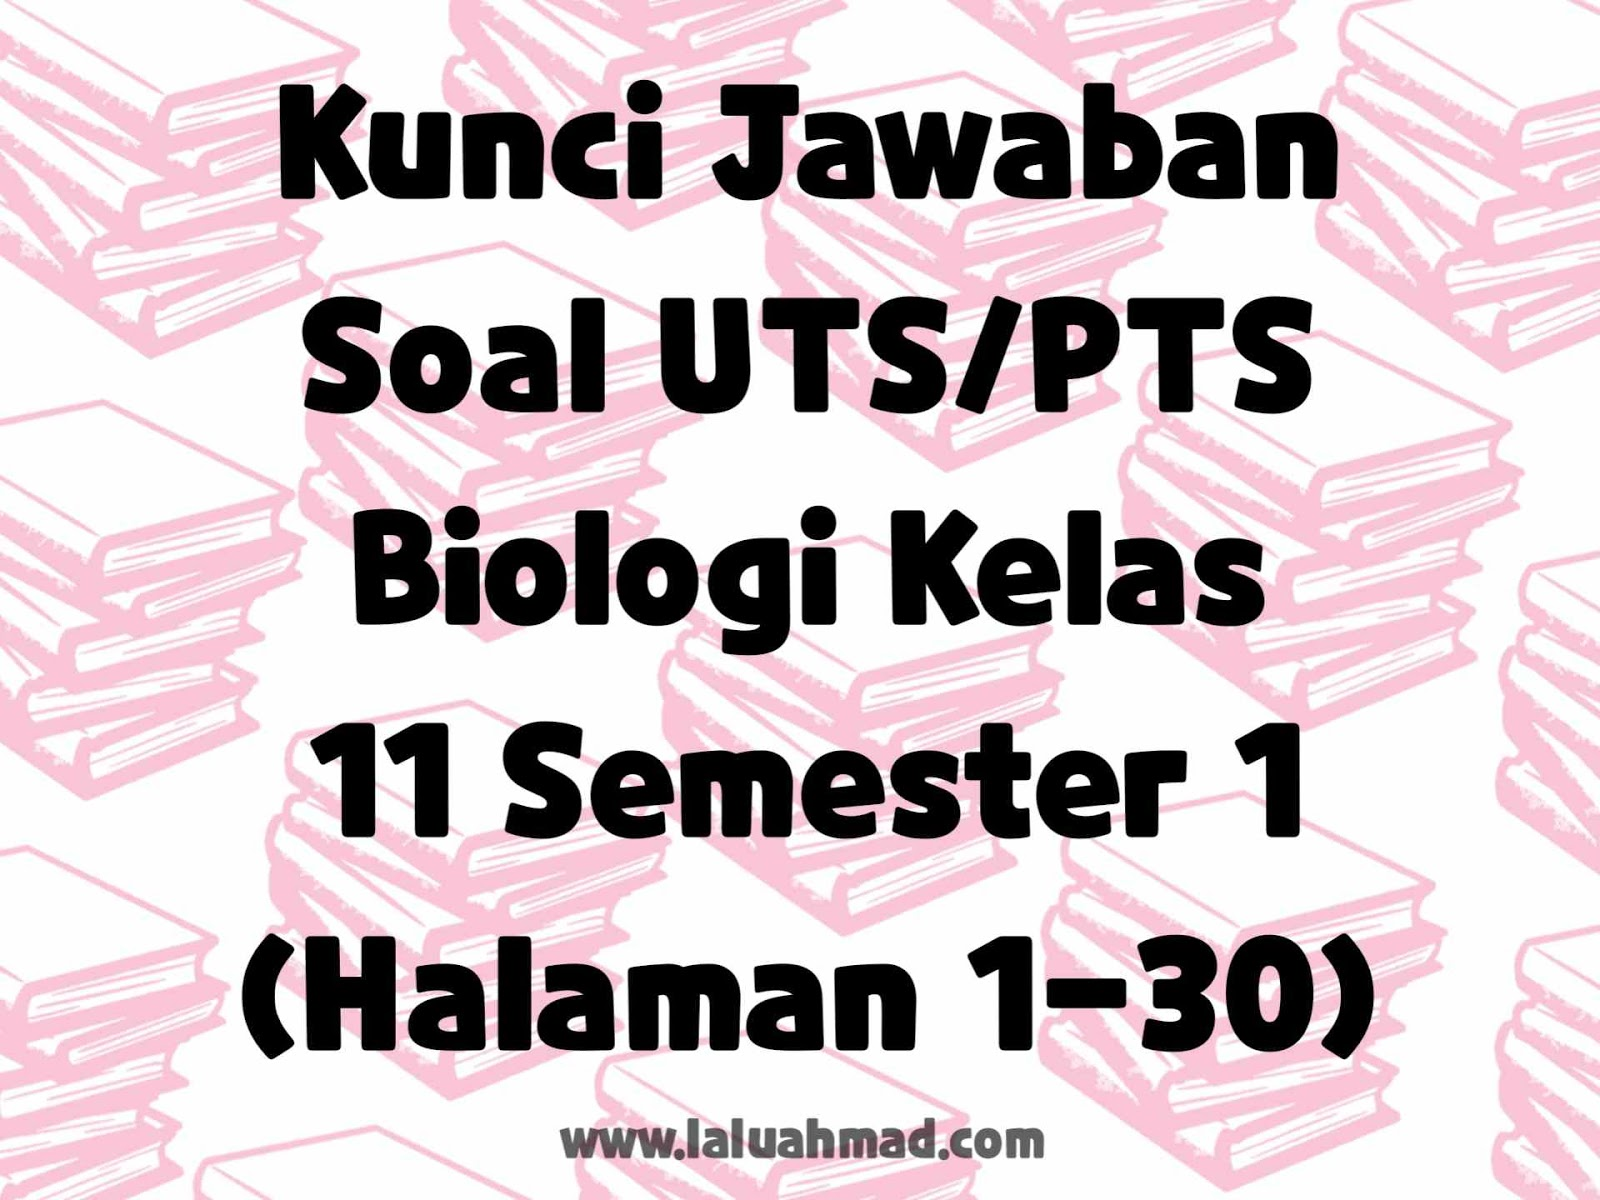 Kunci Jawaban Soal UTS/PTS Biologi Kelas 11 Semester 1 (Halaman 1-30)